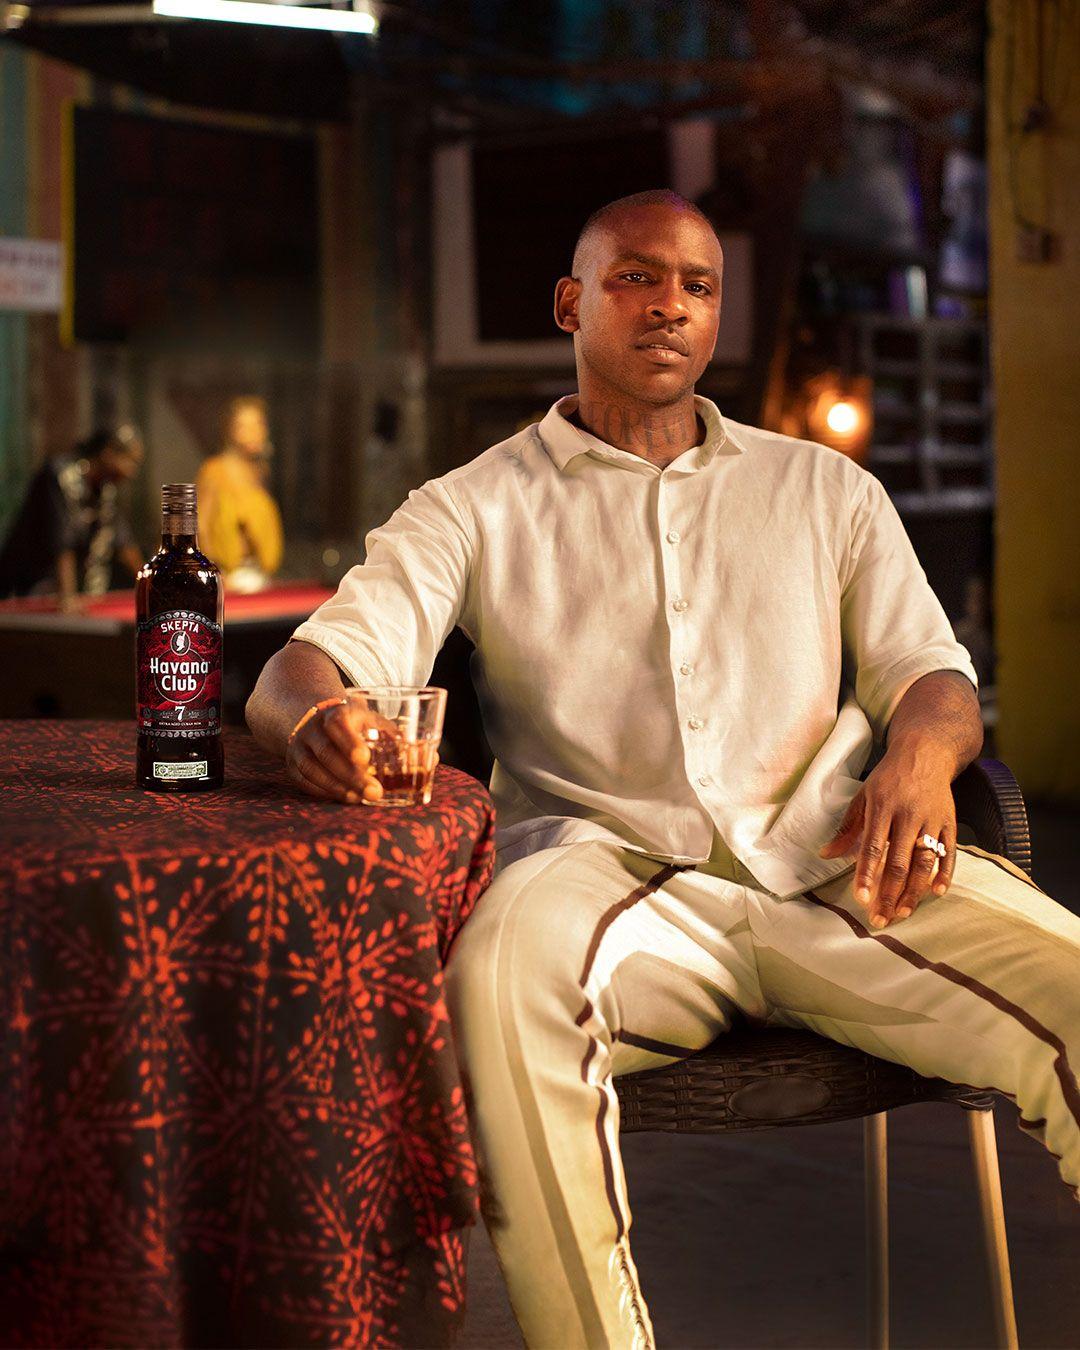 Havana Club and Skepta Get Together to Celebrate Yoruba Culture